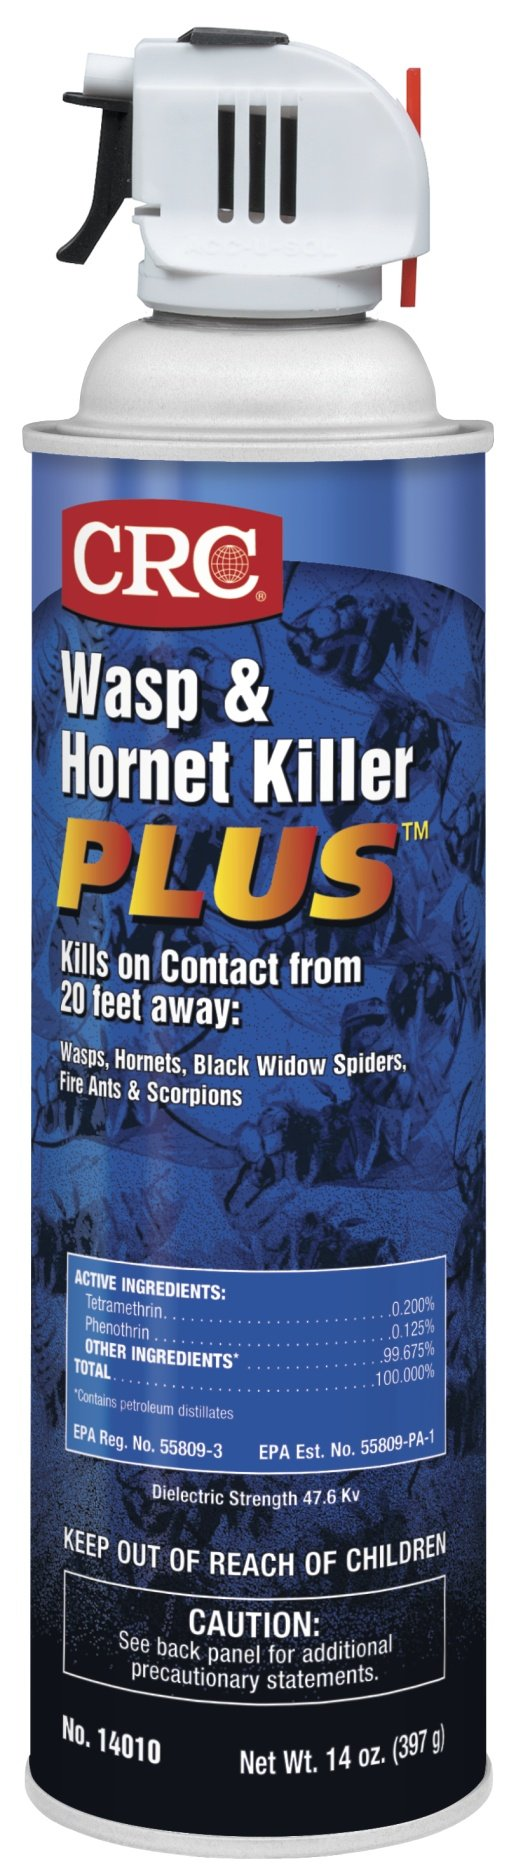 Instant Knockdown Enforcer EWHIK16 Wasp And Hornet Killer, 16 Oz, Aerosol Can, Liquid, Light Yellow by CRC